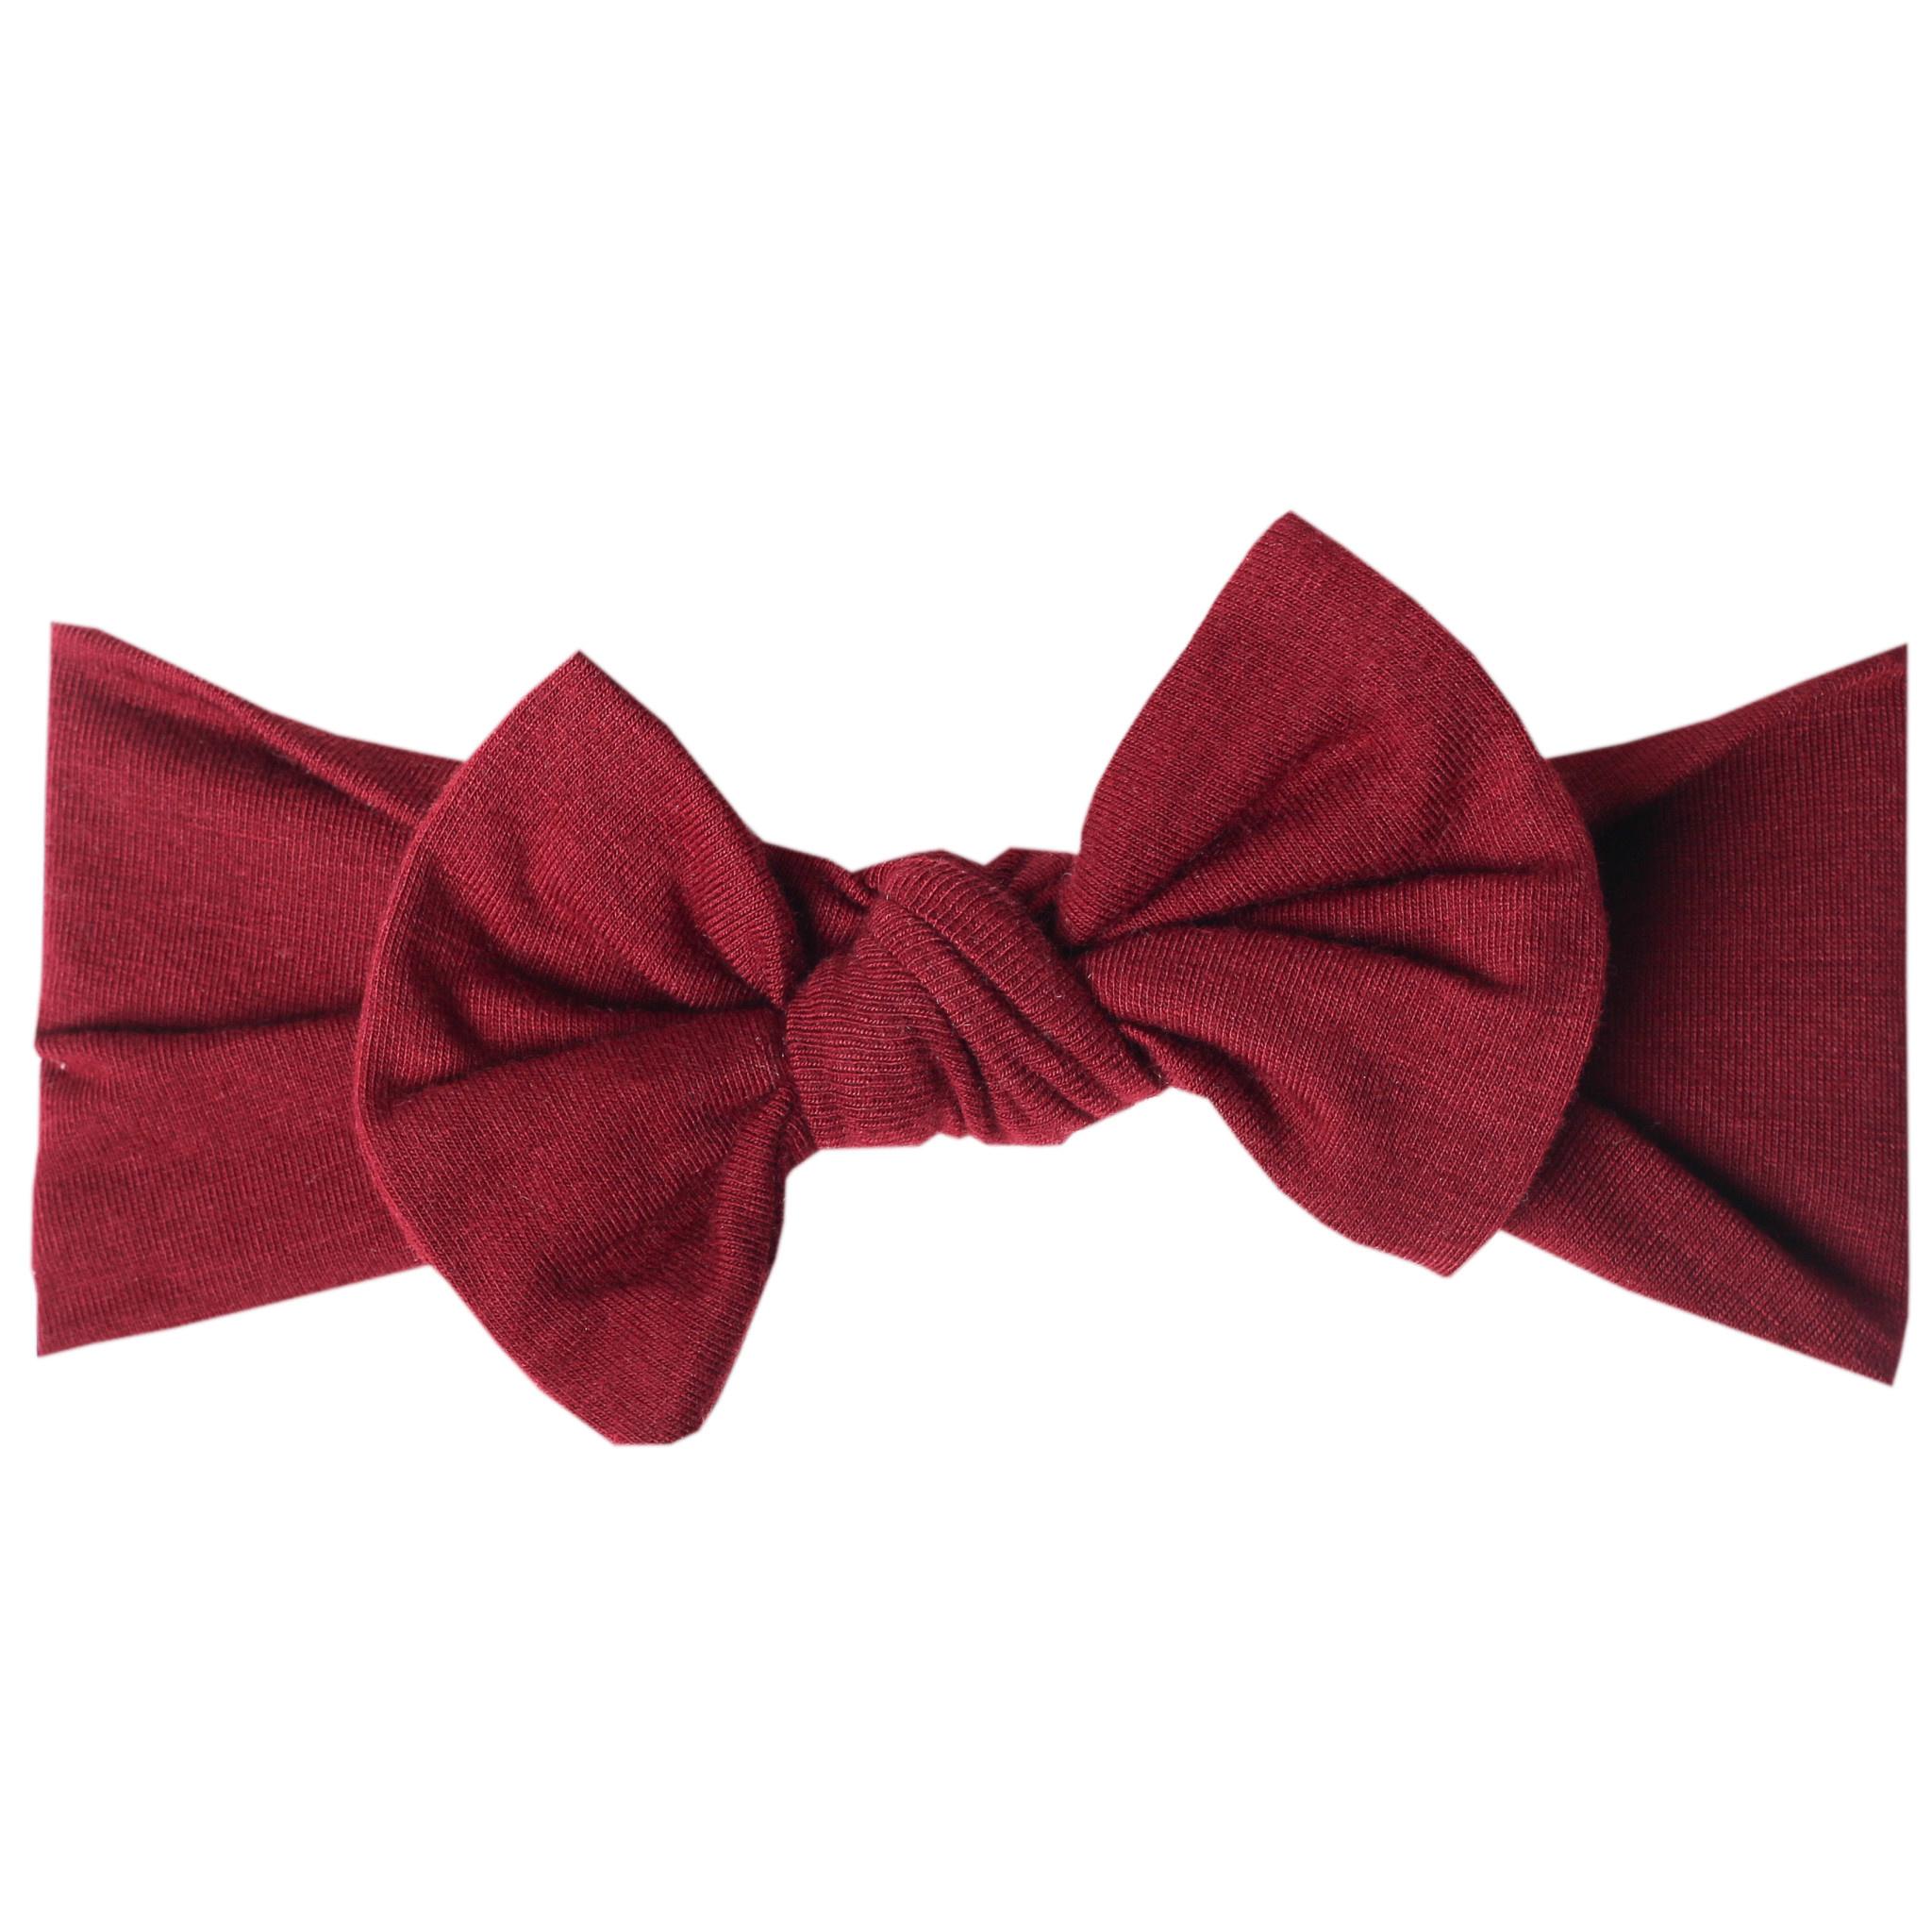 Copper Pearl Knit Headband Ruby